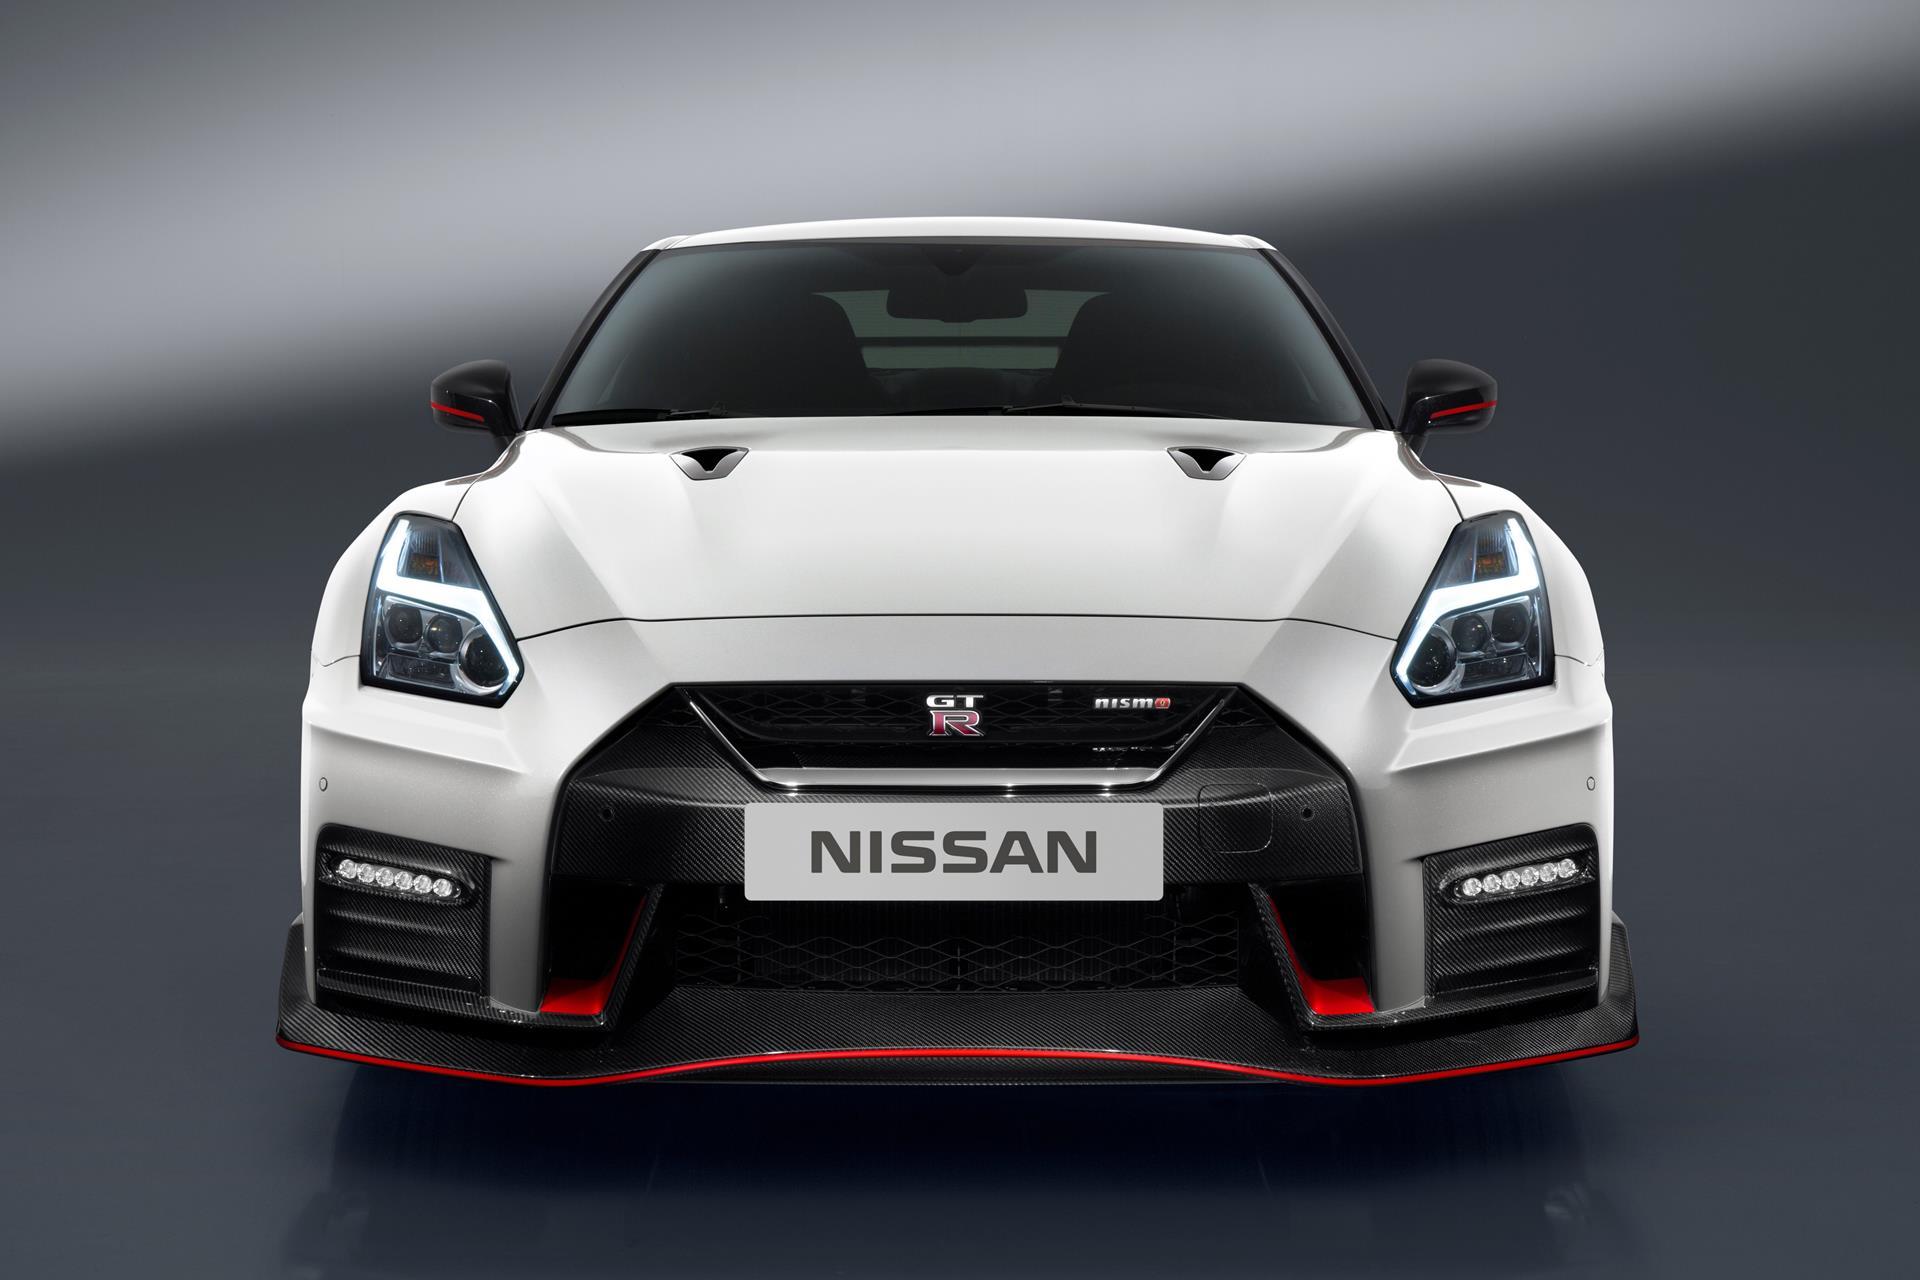 NISSAN GT-R NISMO 真正面のデザイン